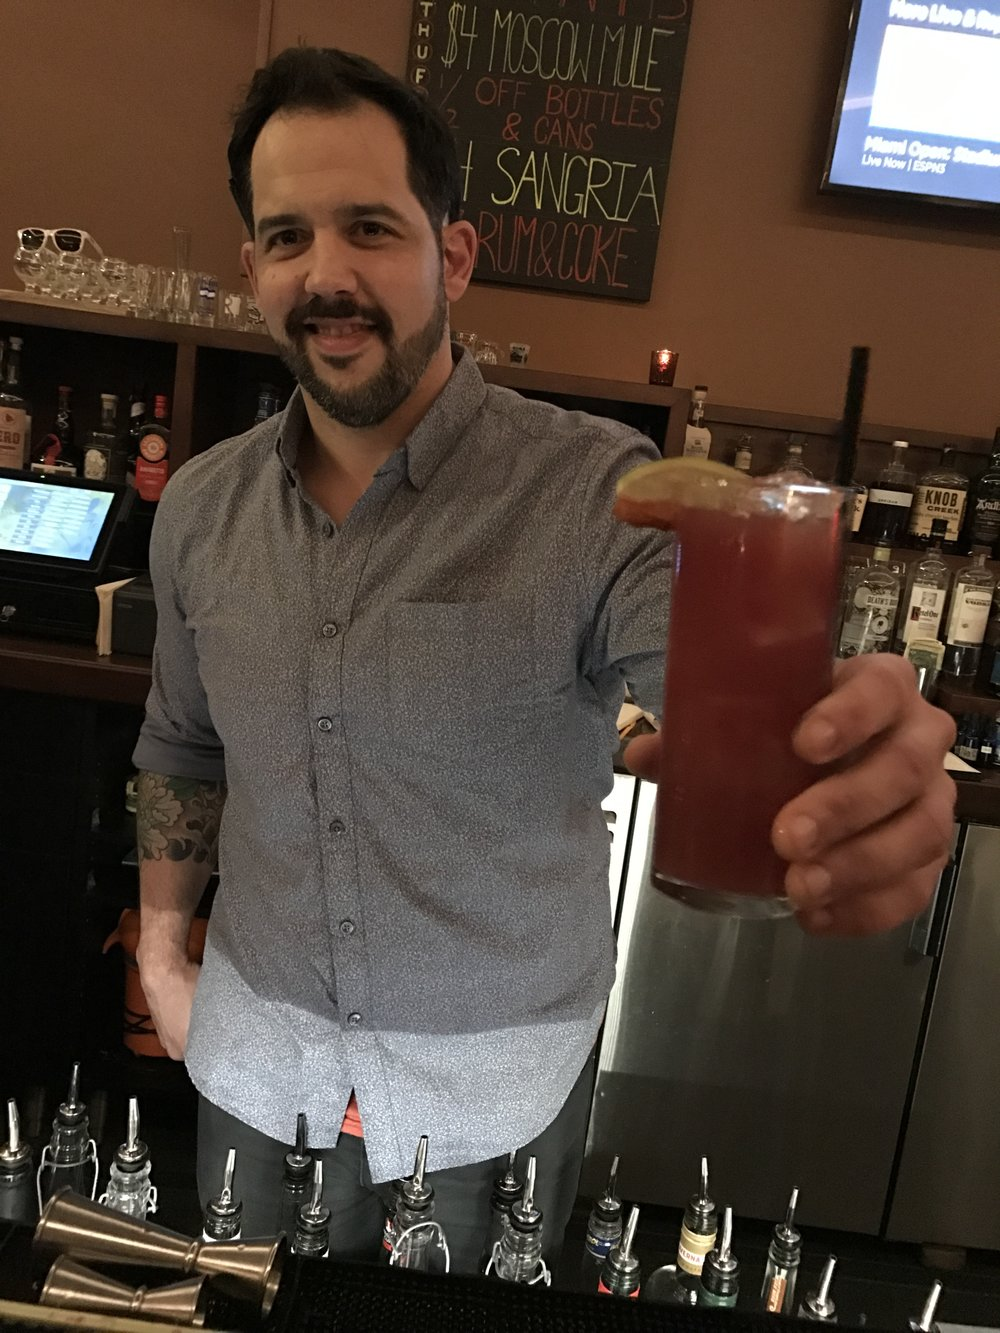 bartender Steve dawson with the 'Vampiros Mexicanos